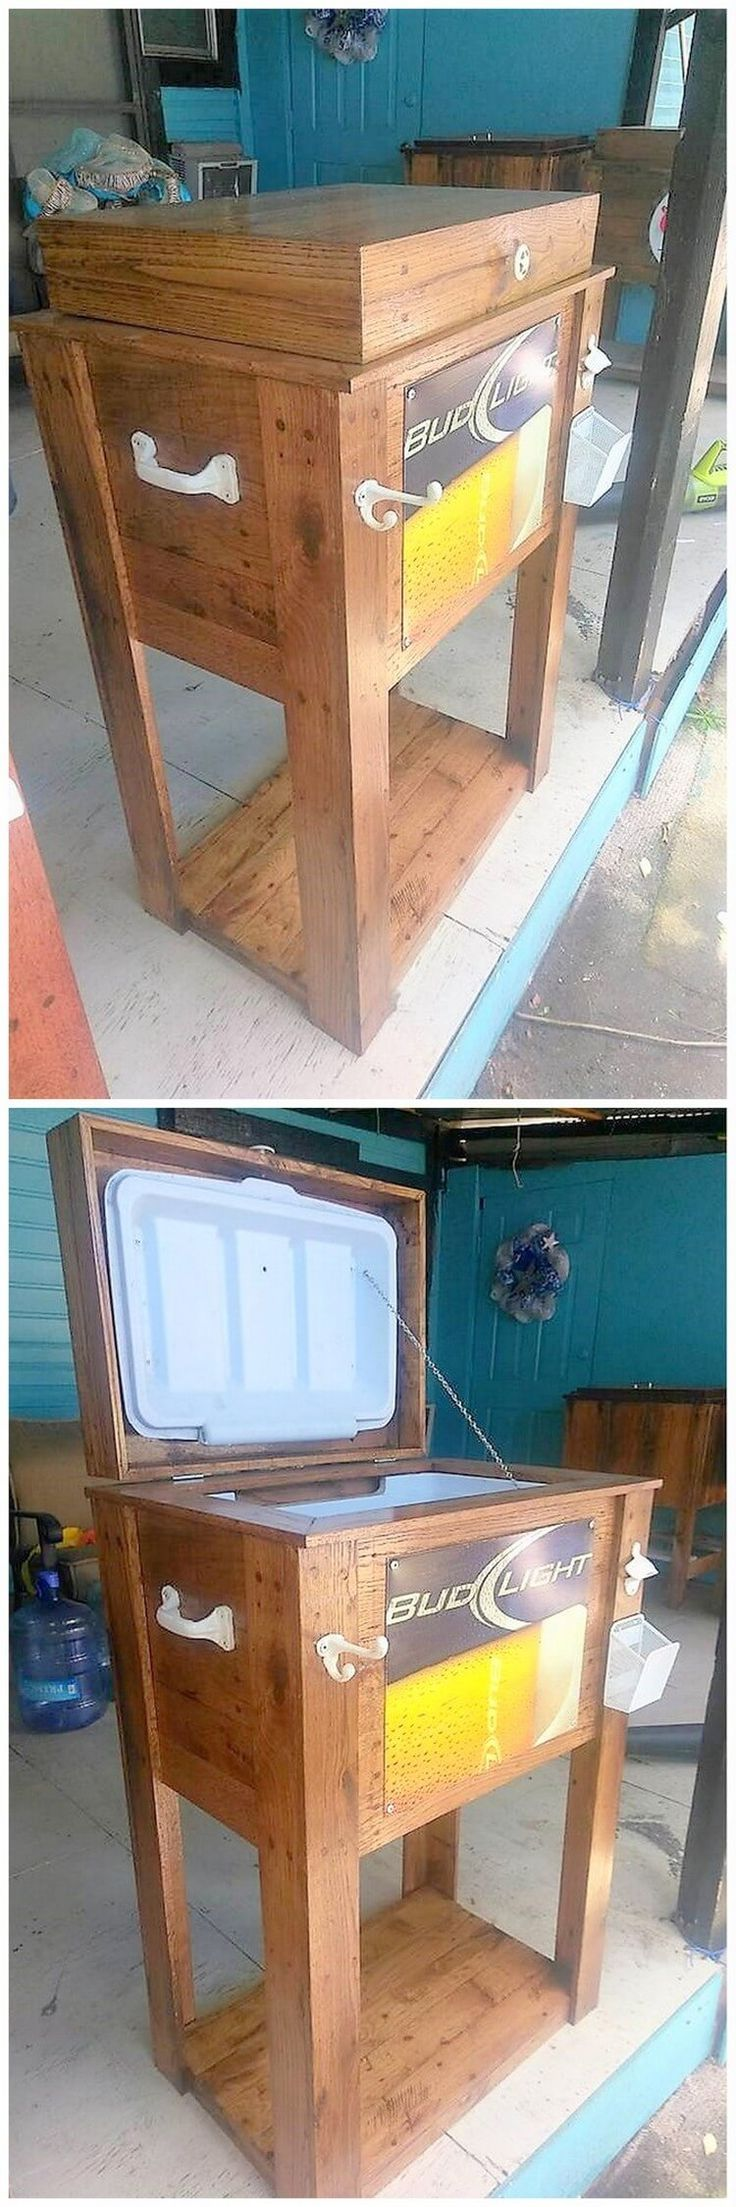 Wooden Pallet Cooler Idea